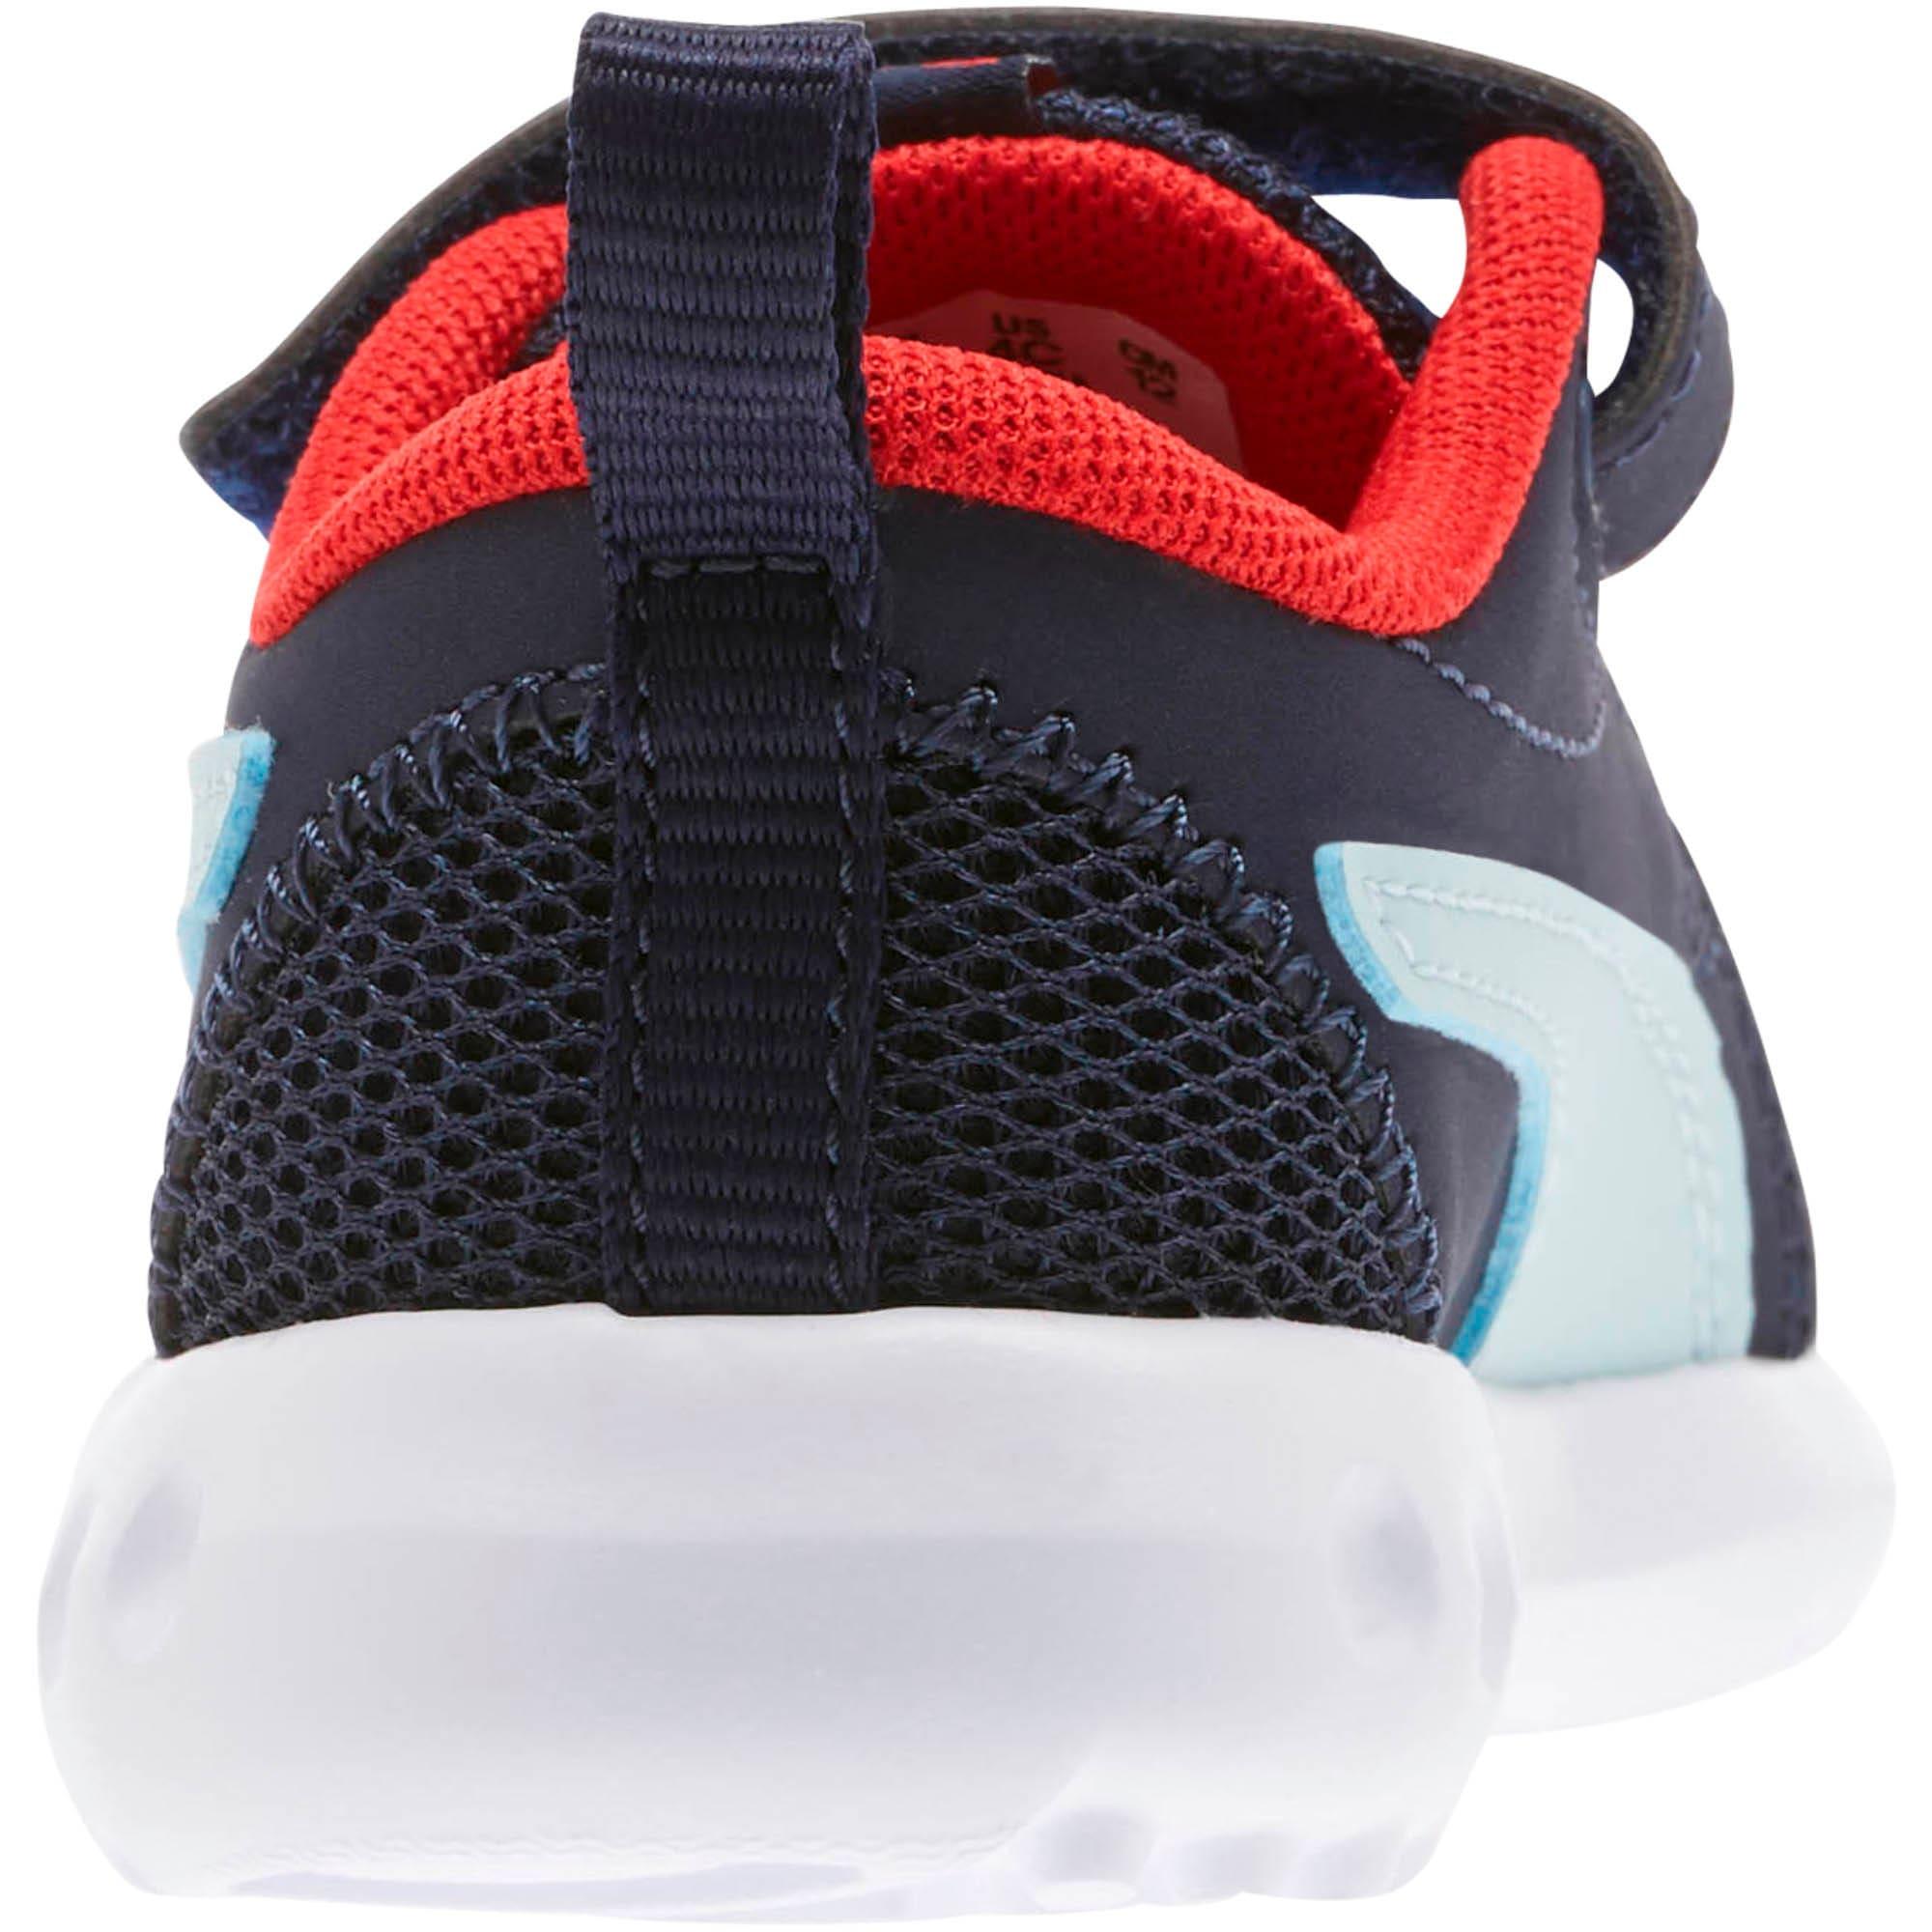 Miniatura 3 de Zapatos Carson2 Casual para bebés, Peacoat-Light Sky-Red, mediano